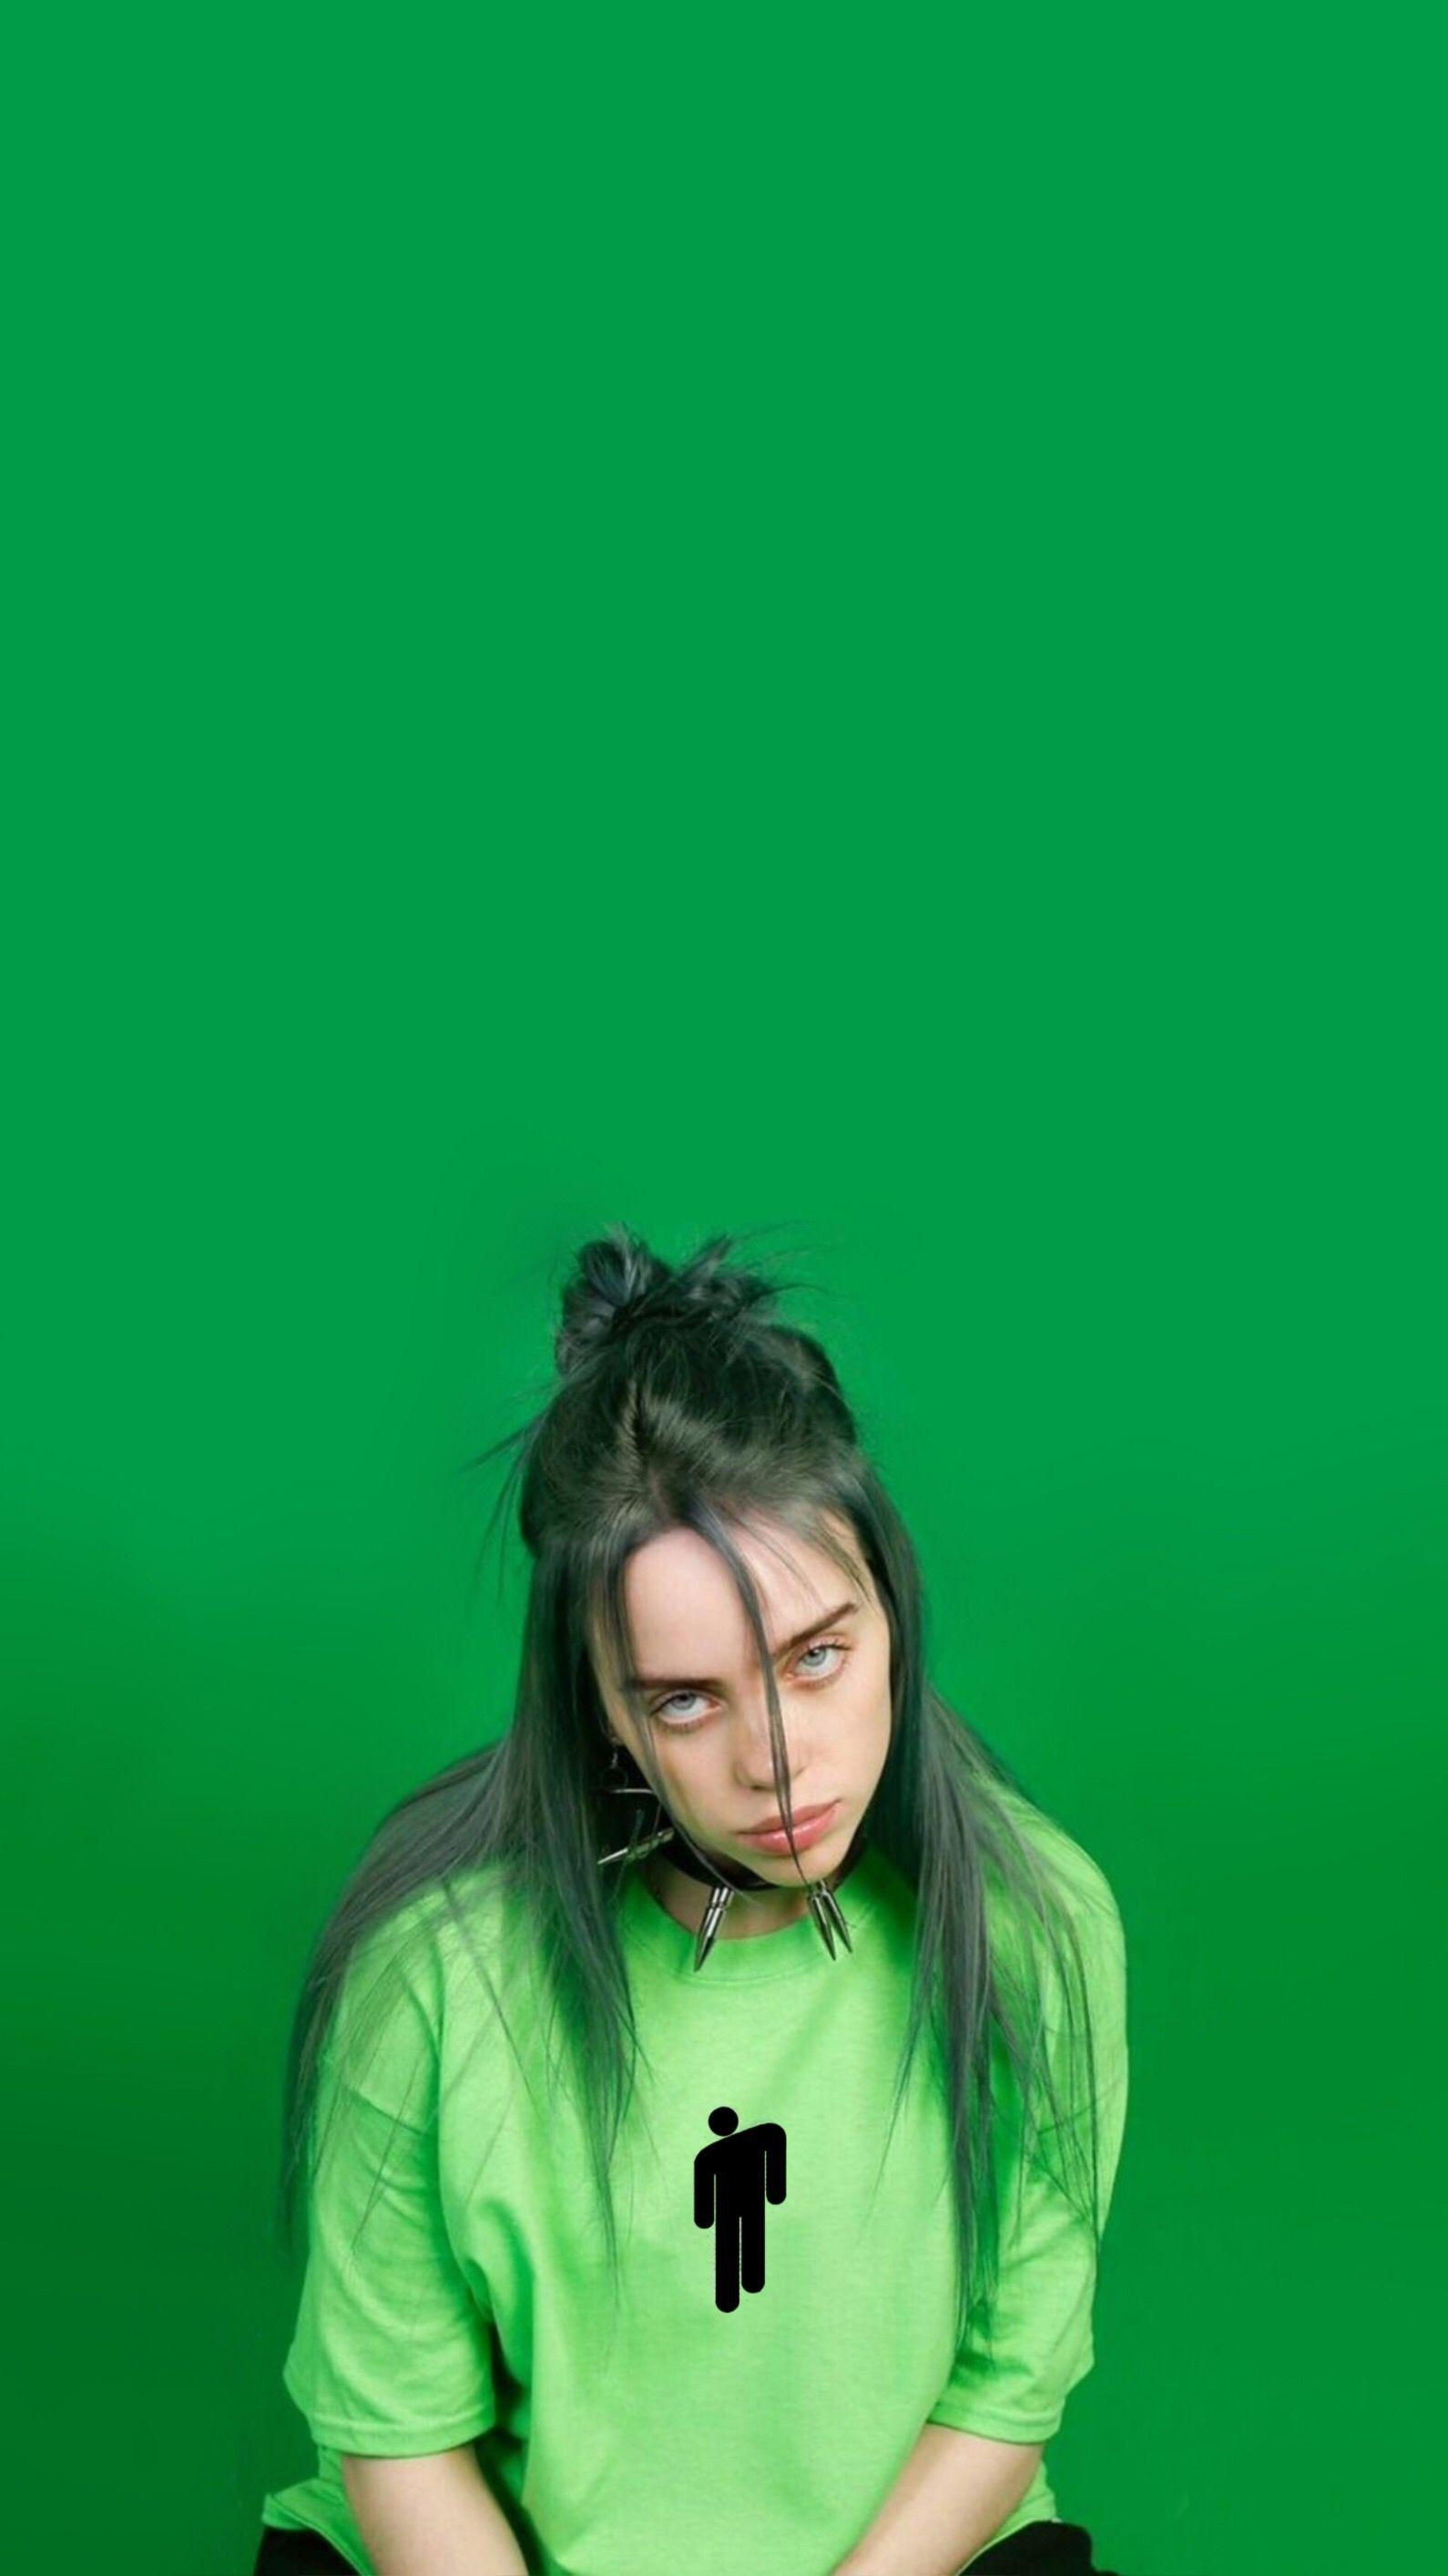 Billie Eilish Green Wallpapers Wallpaper Cave